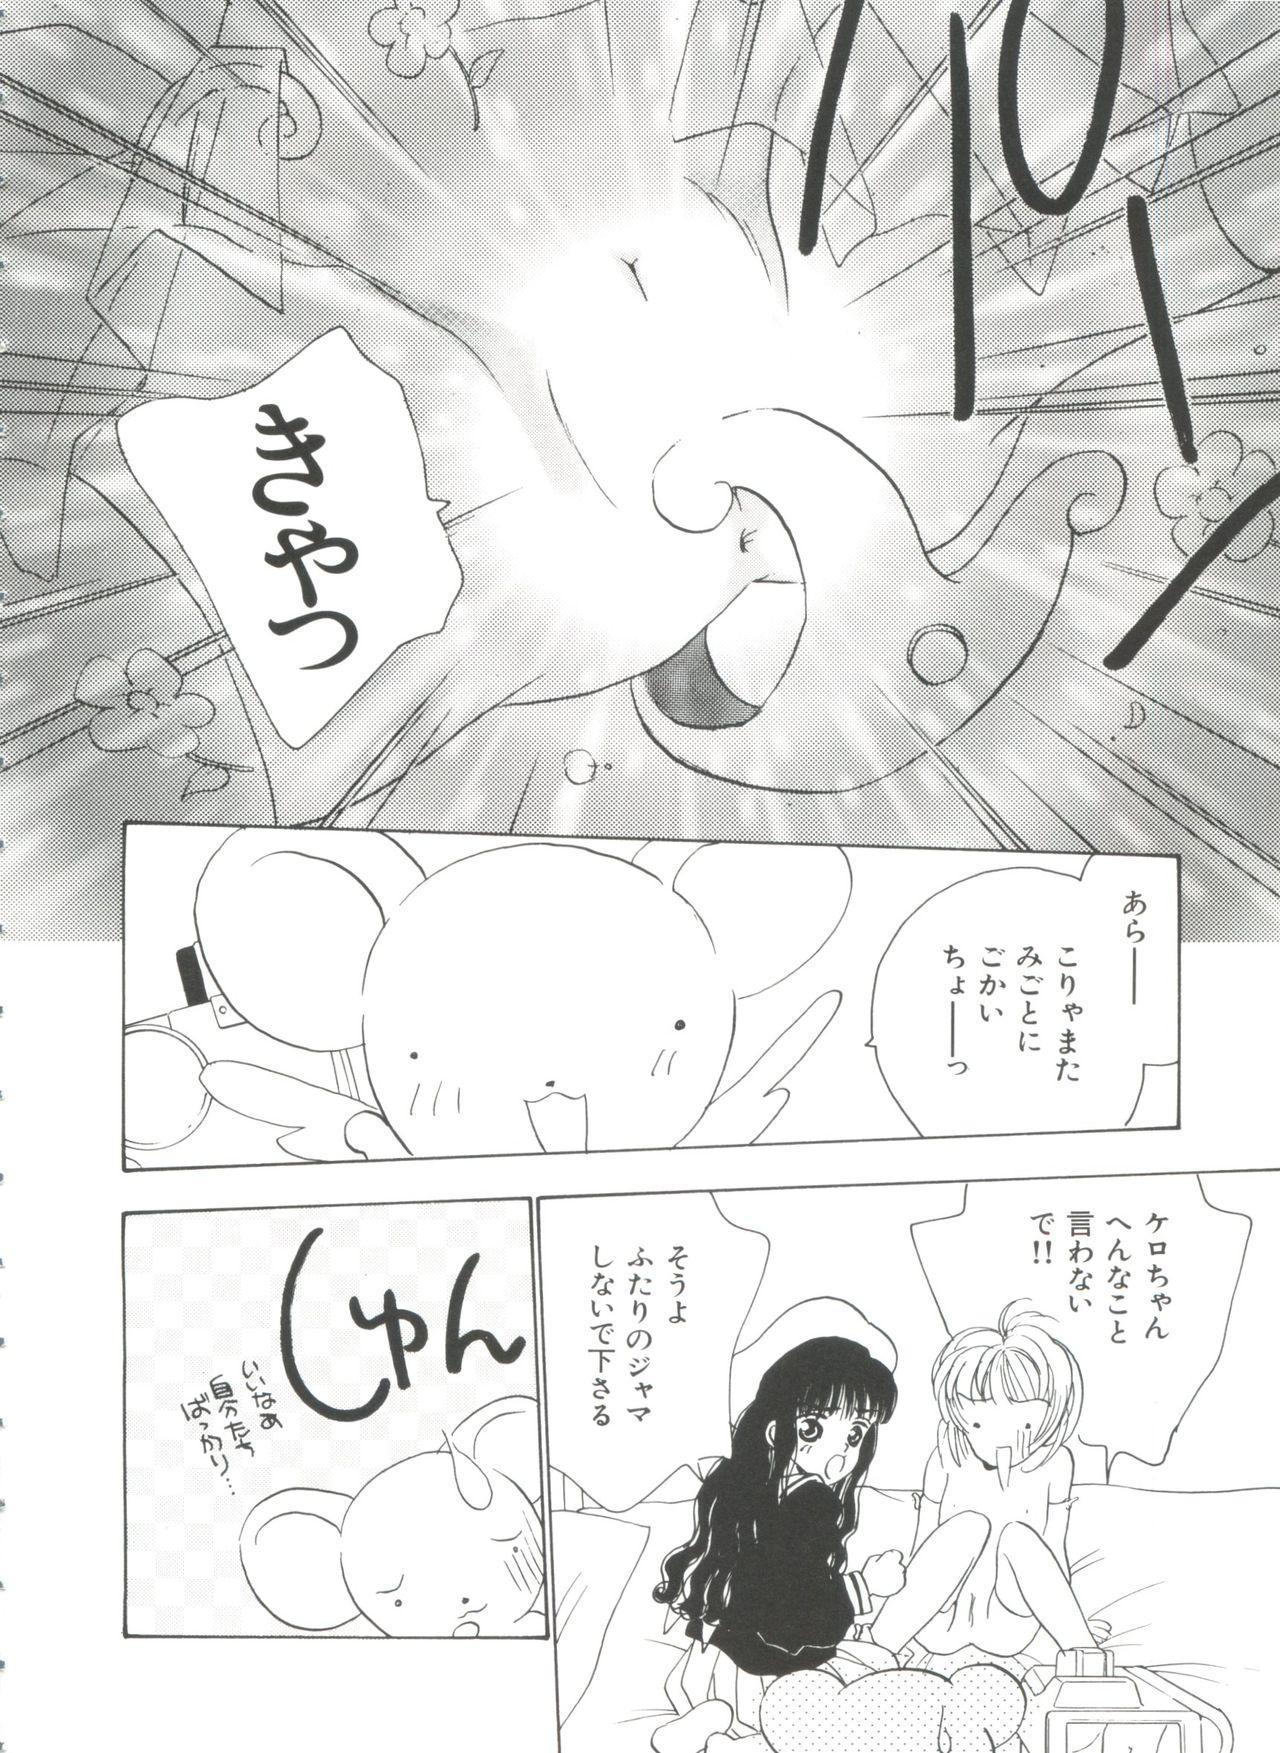 Ero-chan to Issho 15